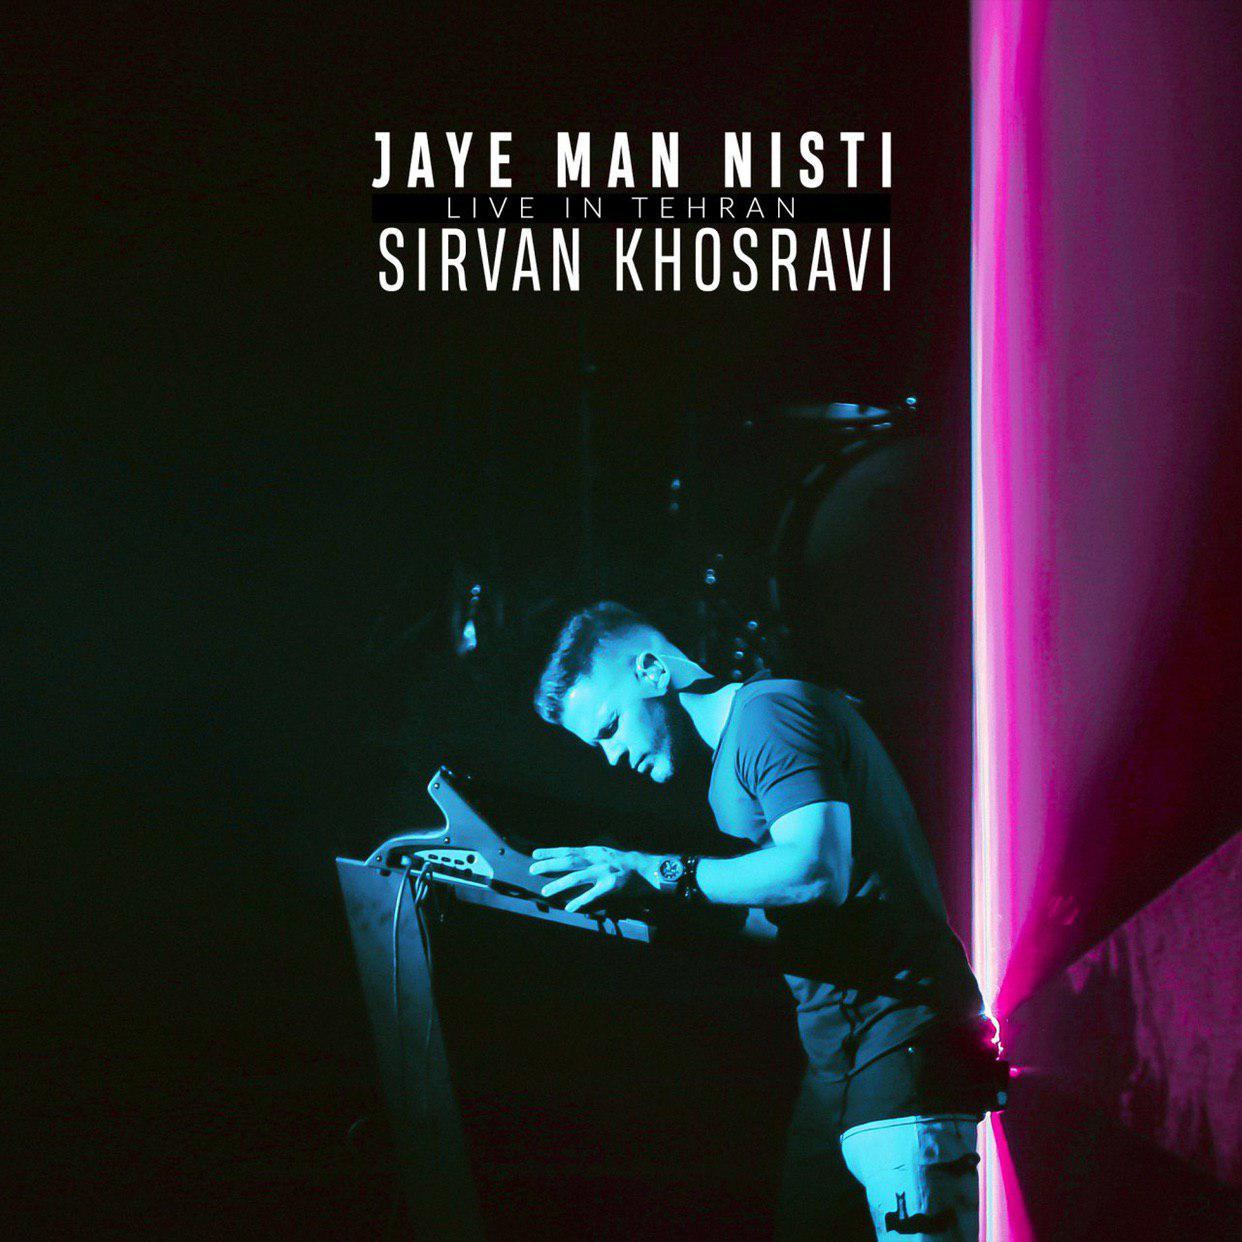 Sirvan Khosravi – Jaye Man Nisti (Live)